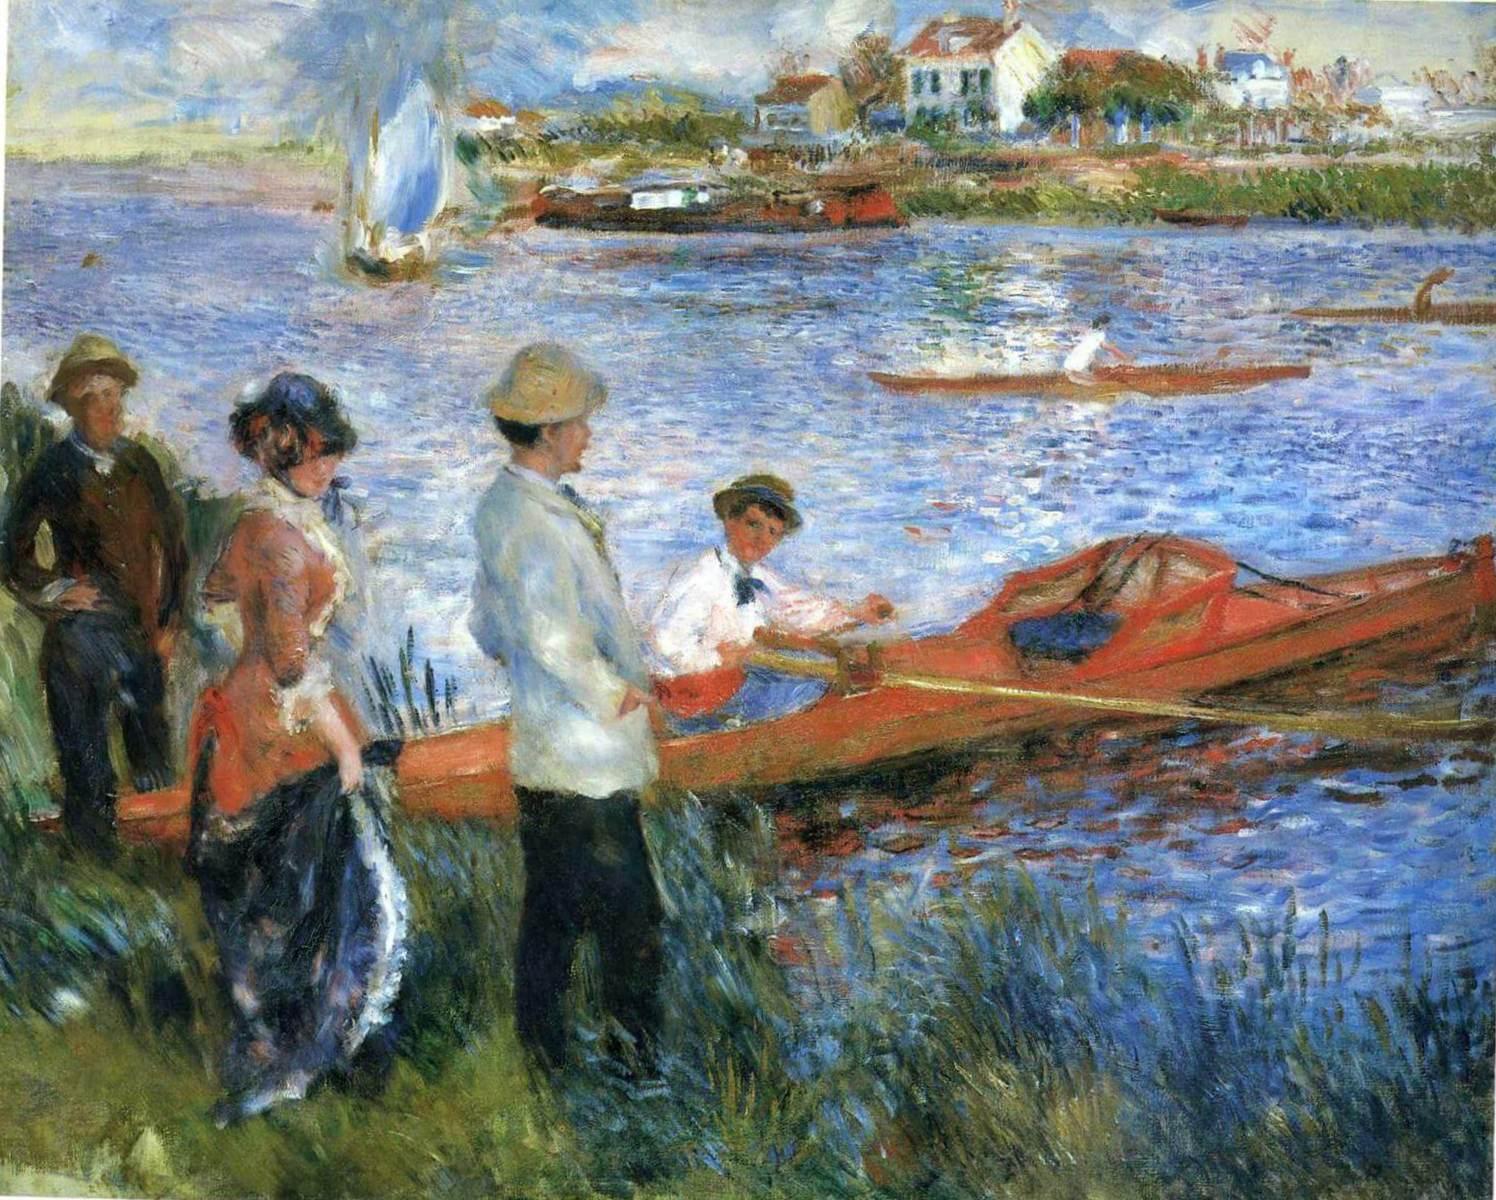 Гребцы в Шату - Пьер Огюст Ренуар (1879, Национальная галерея, Вашингтон)